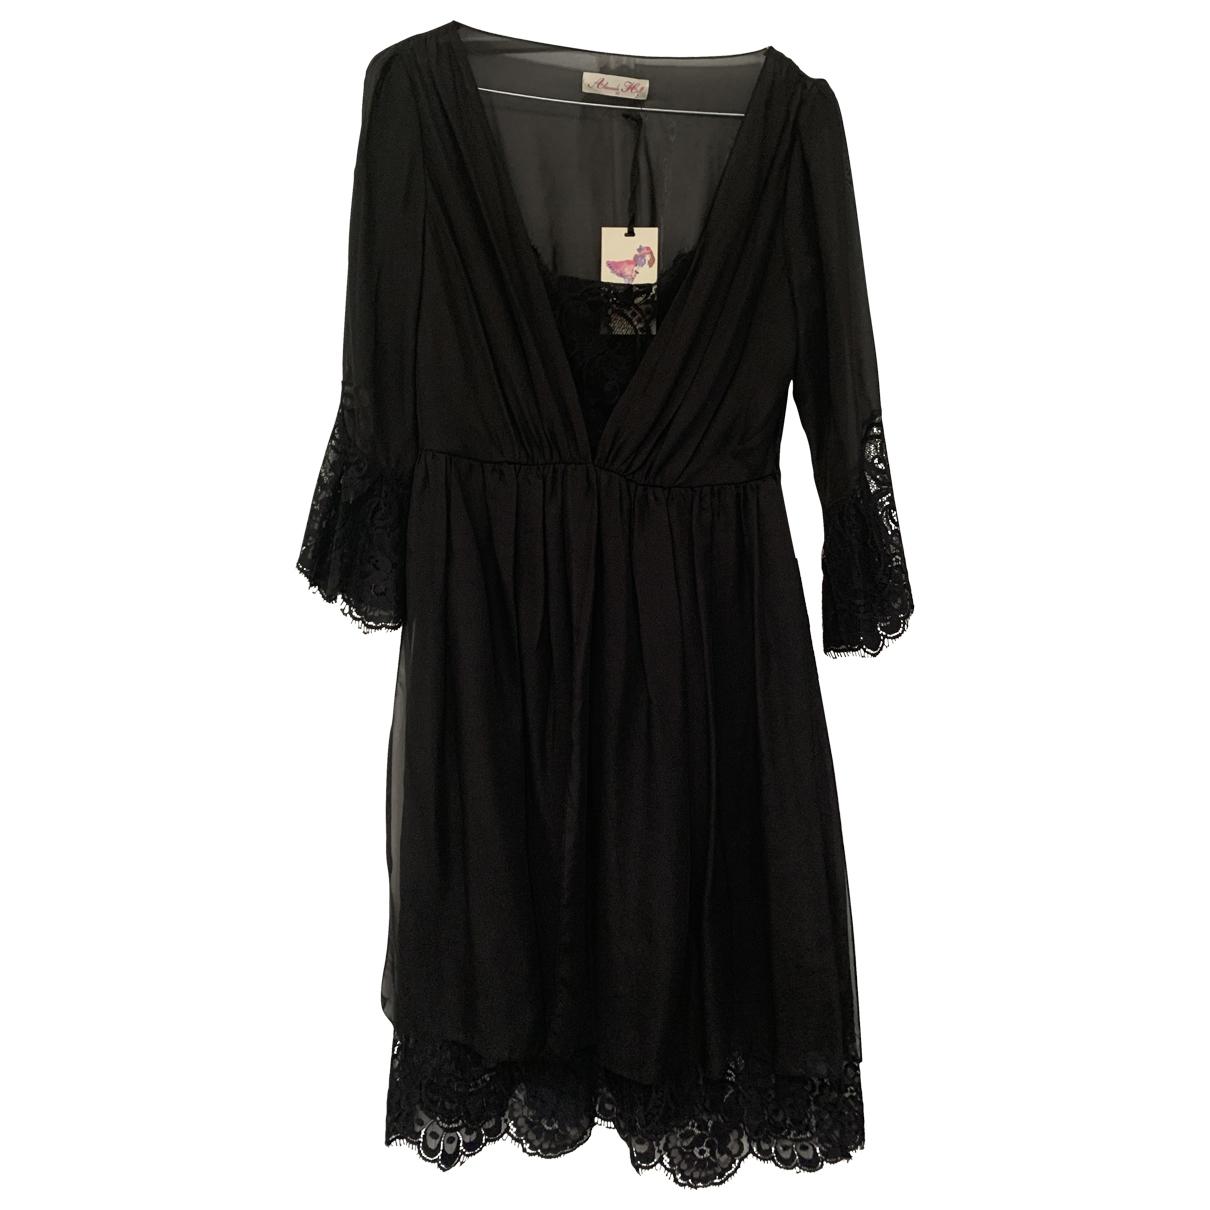 Alannah Hill \N Kleid in  Schwarz Seide